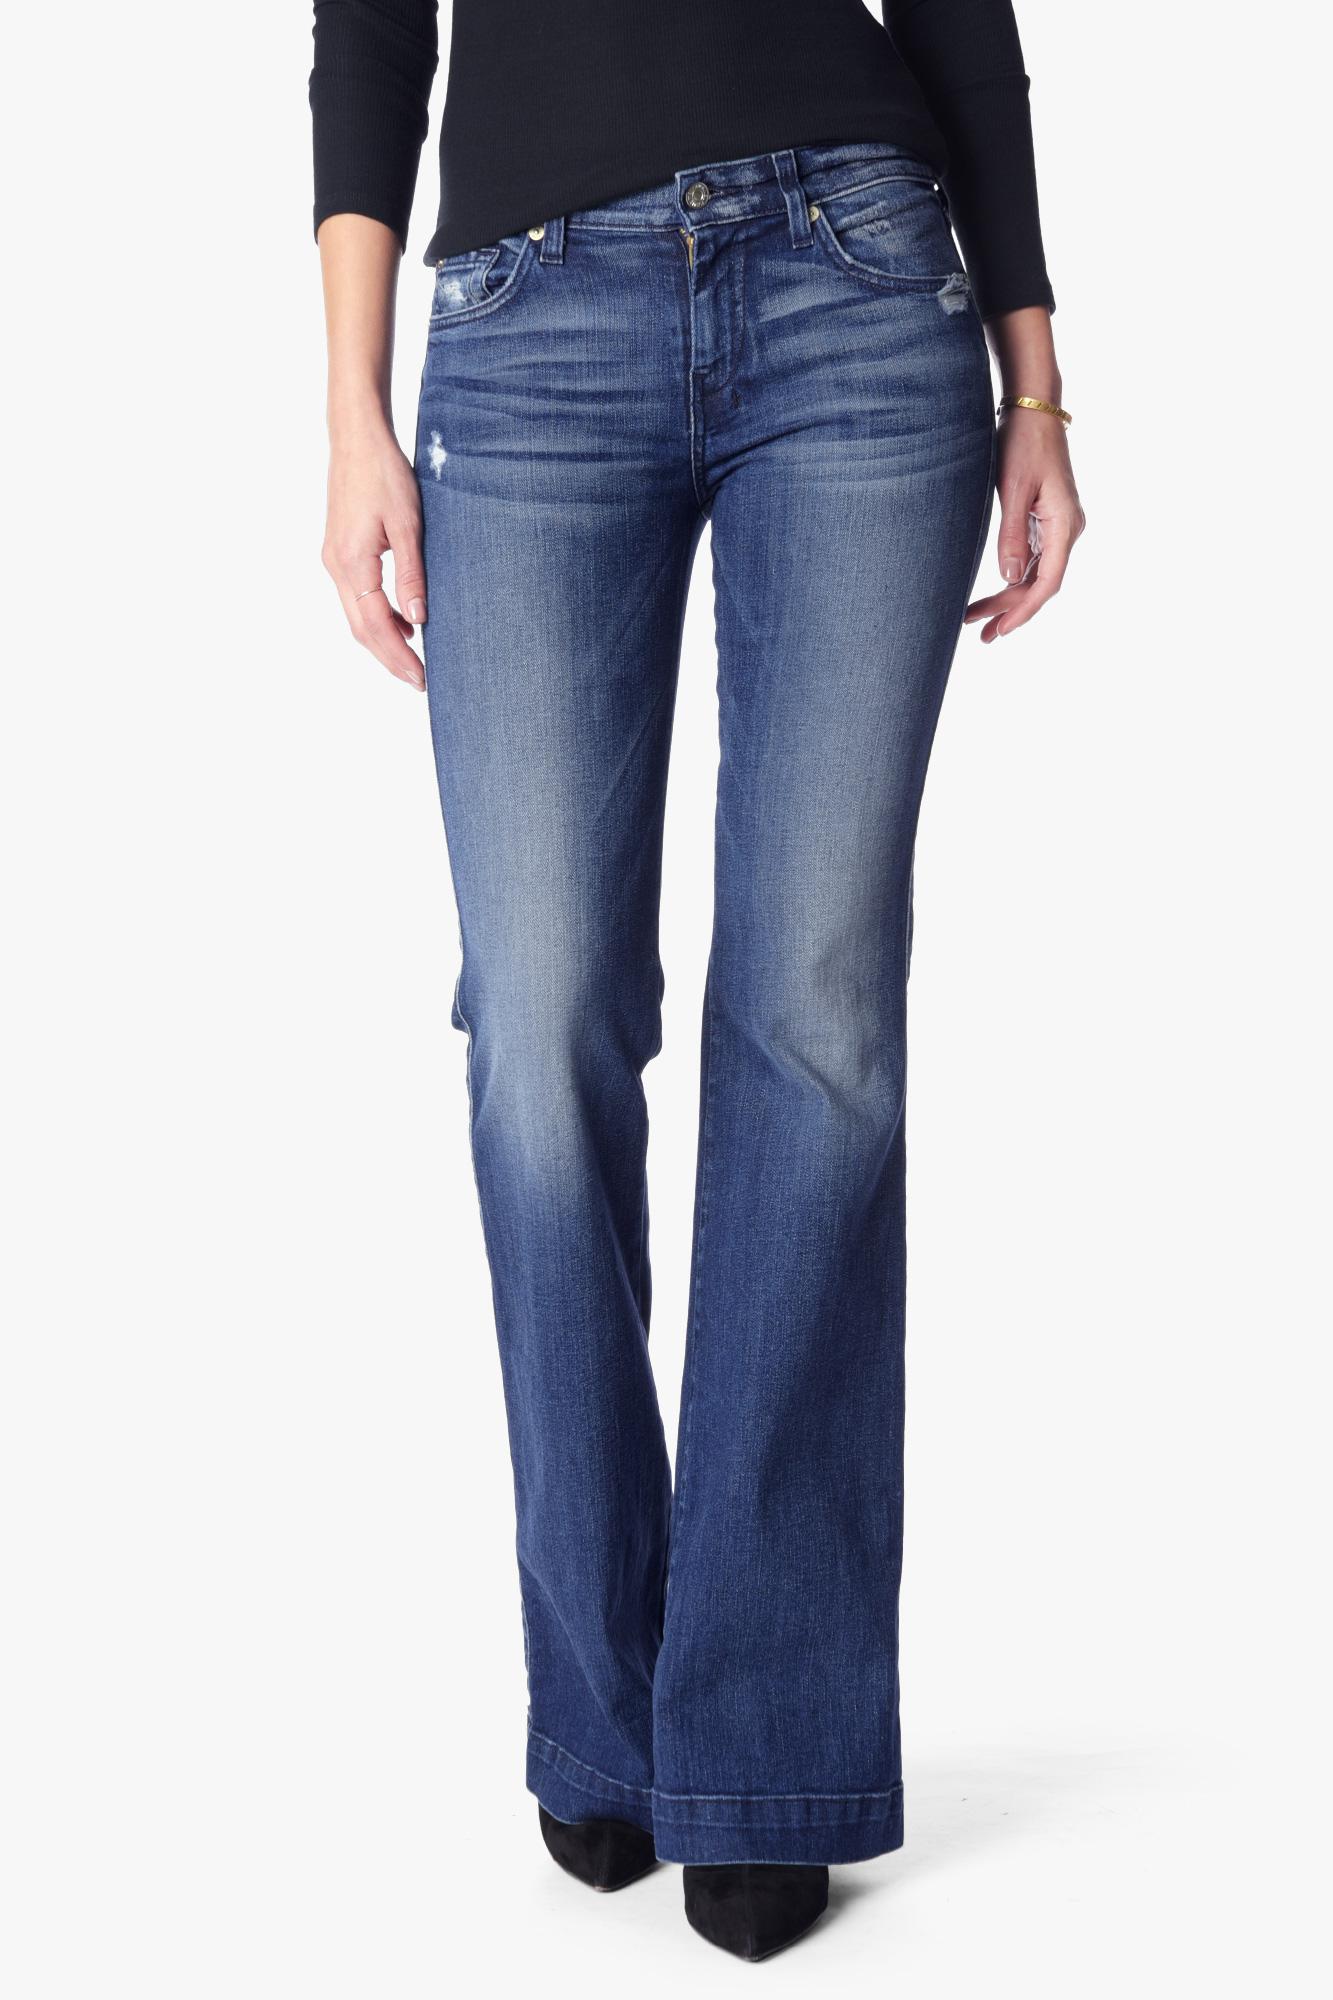 For All Mankind Women's Dojo Original Trouser Jean in Lake Blue